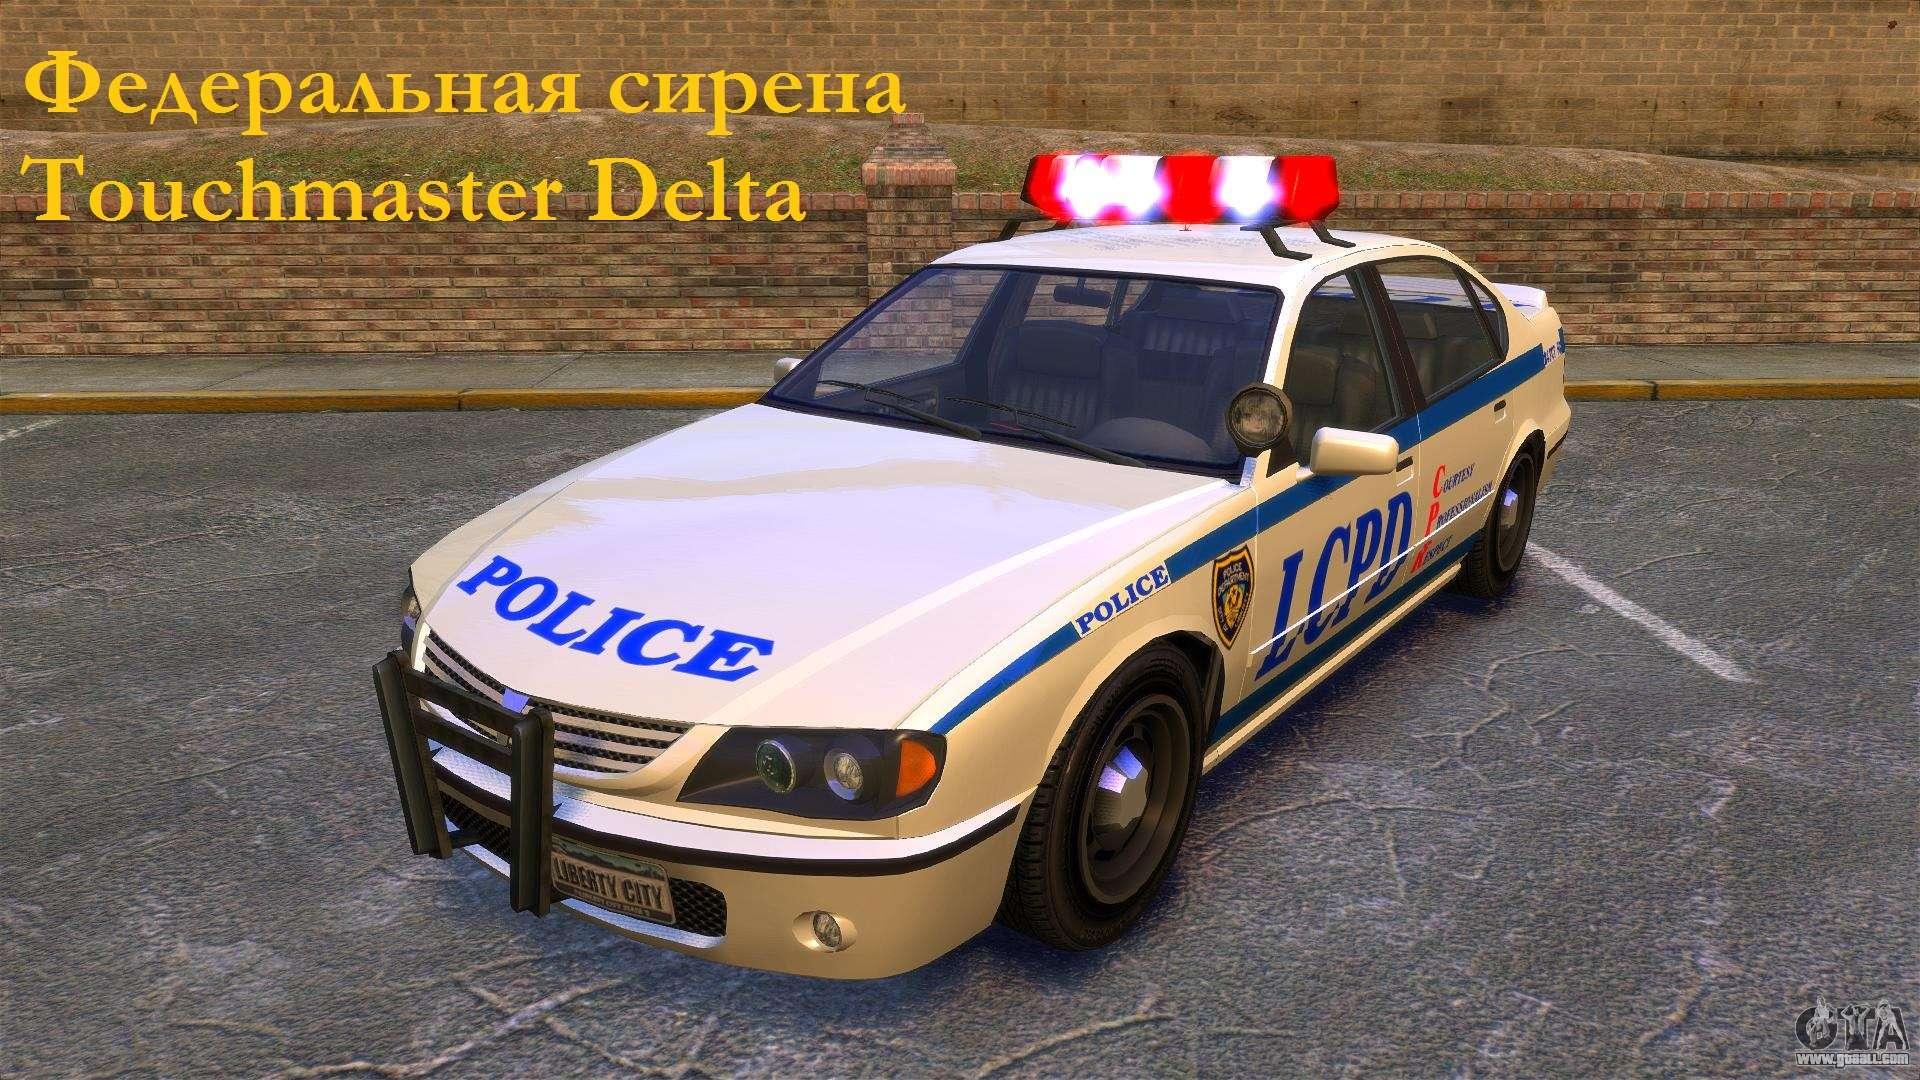 Federal siren Touchmaster Delta for GTA 4